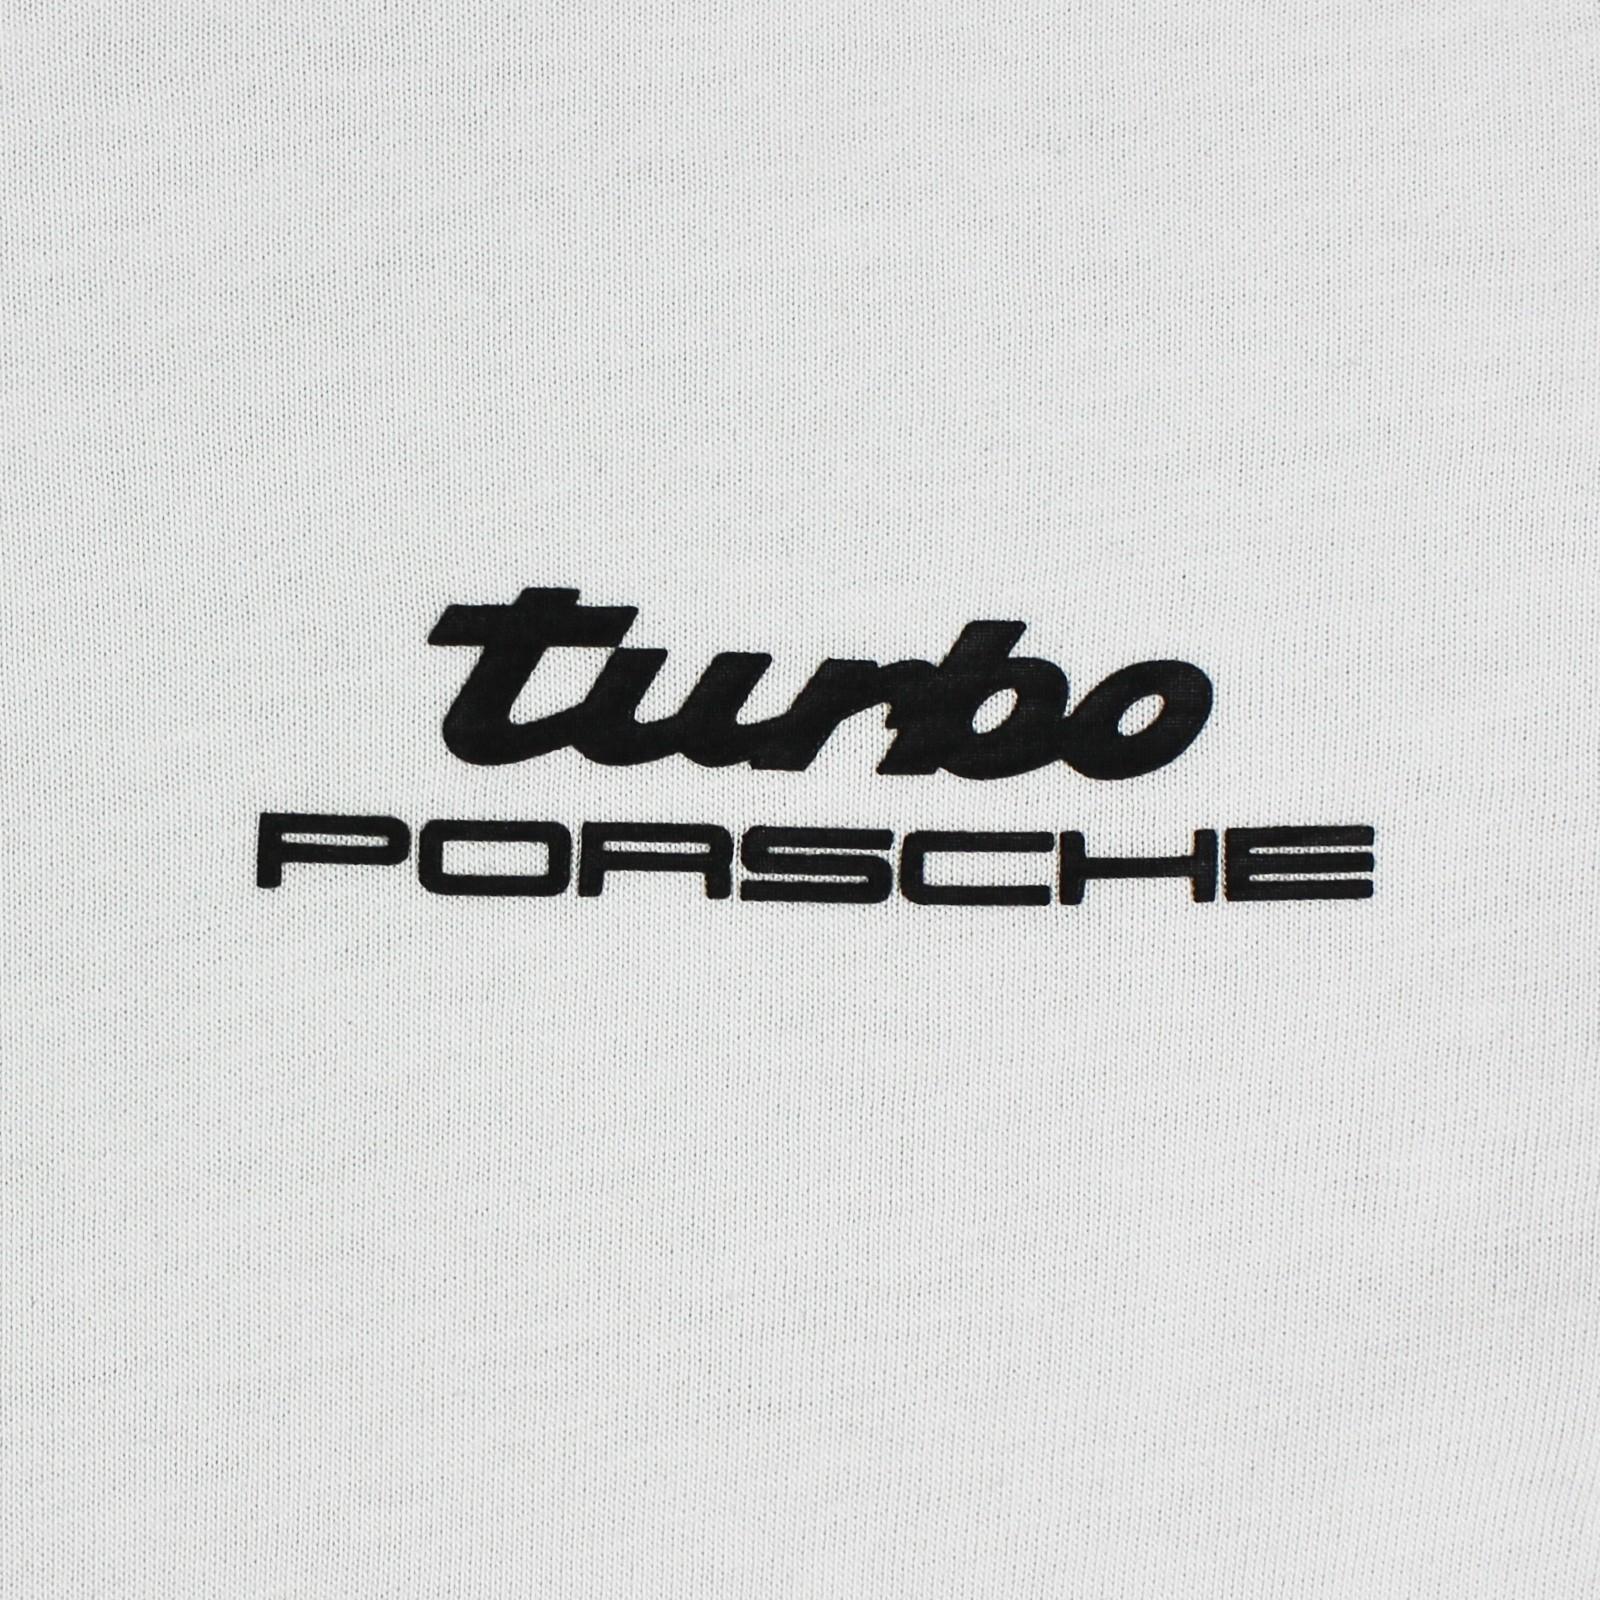 adidas originals hombre porsche 911 turbo dise u00f1o camiseta vintage blanco s